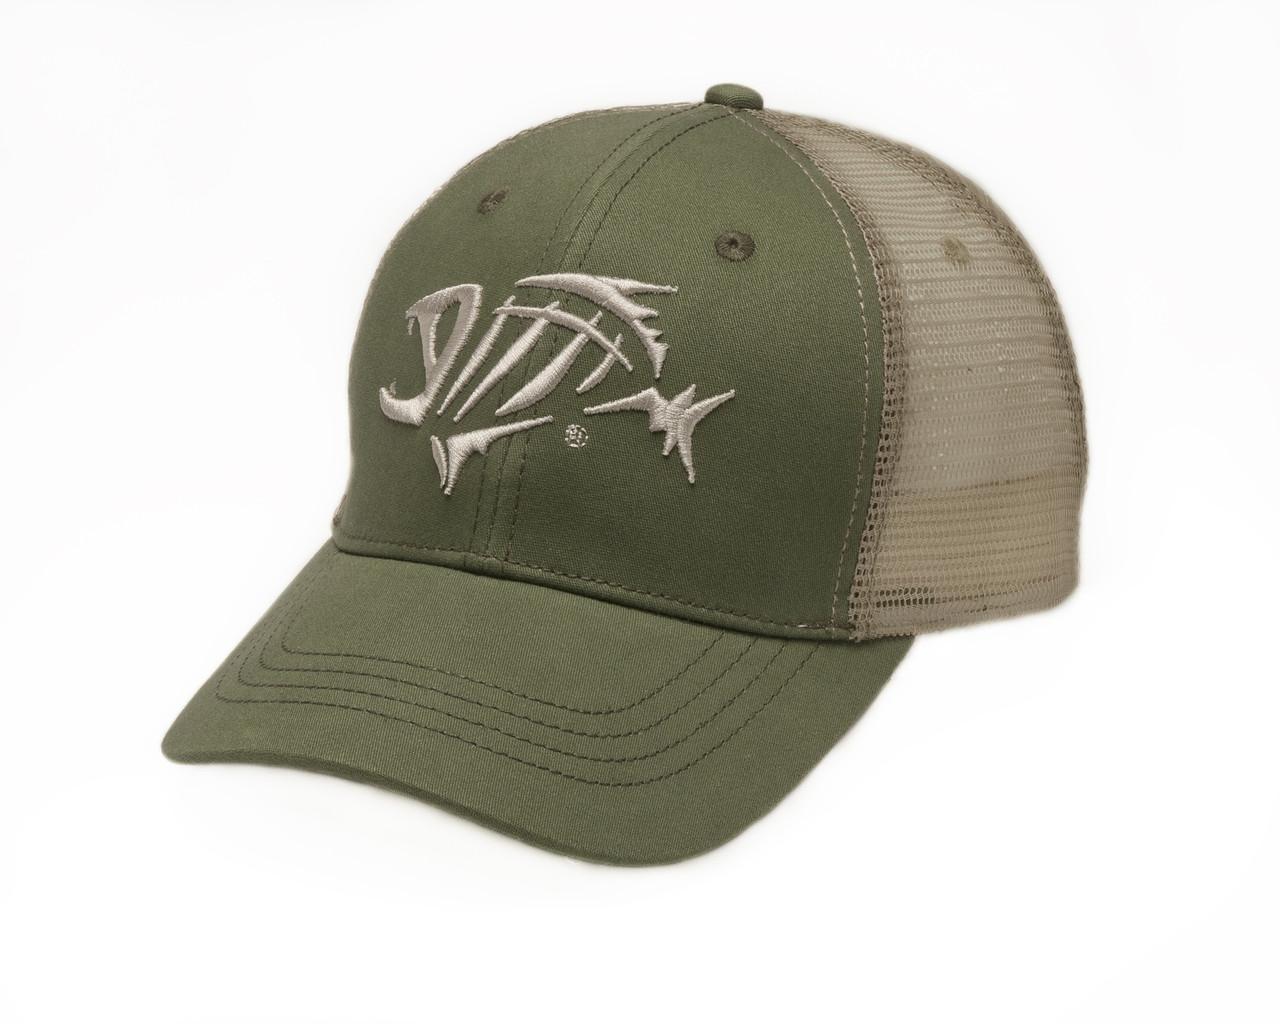 b5d70004577bb G. Loomis Skeleton Fish Logo Bandit Trucker Fishing Cap - Swanson s ...